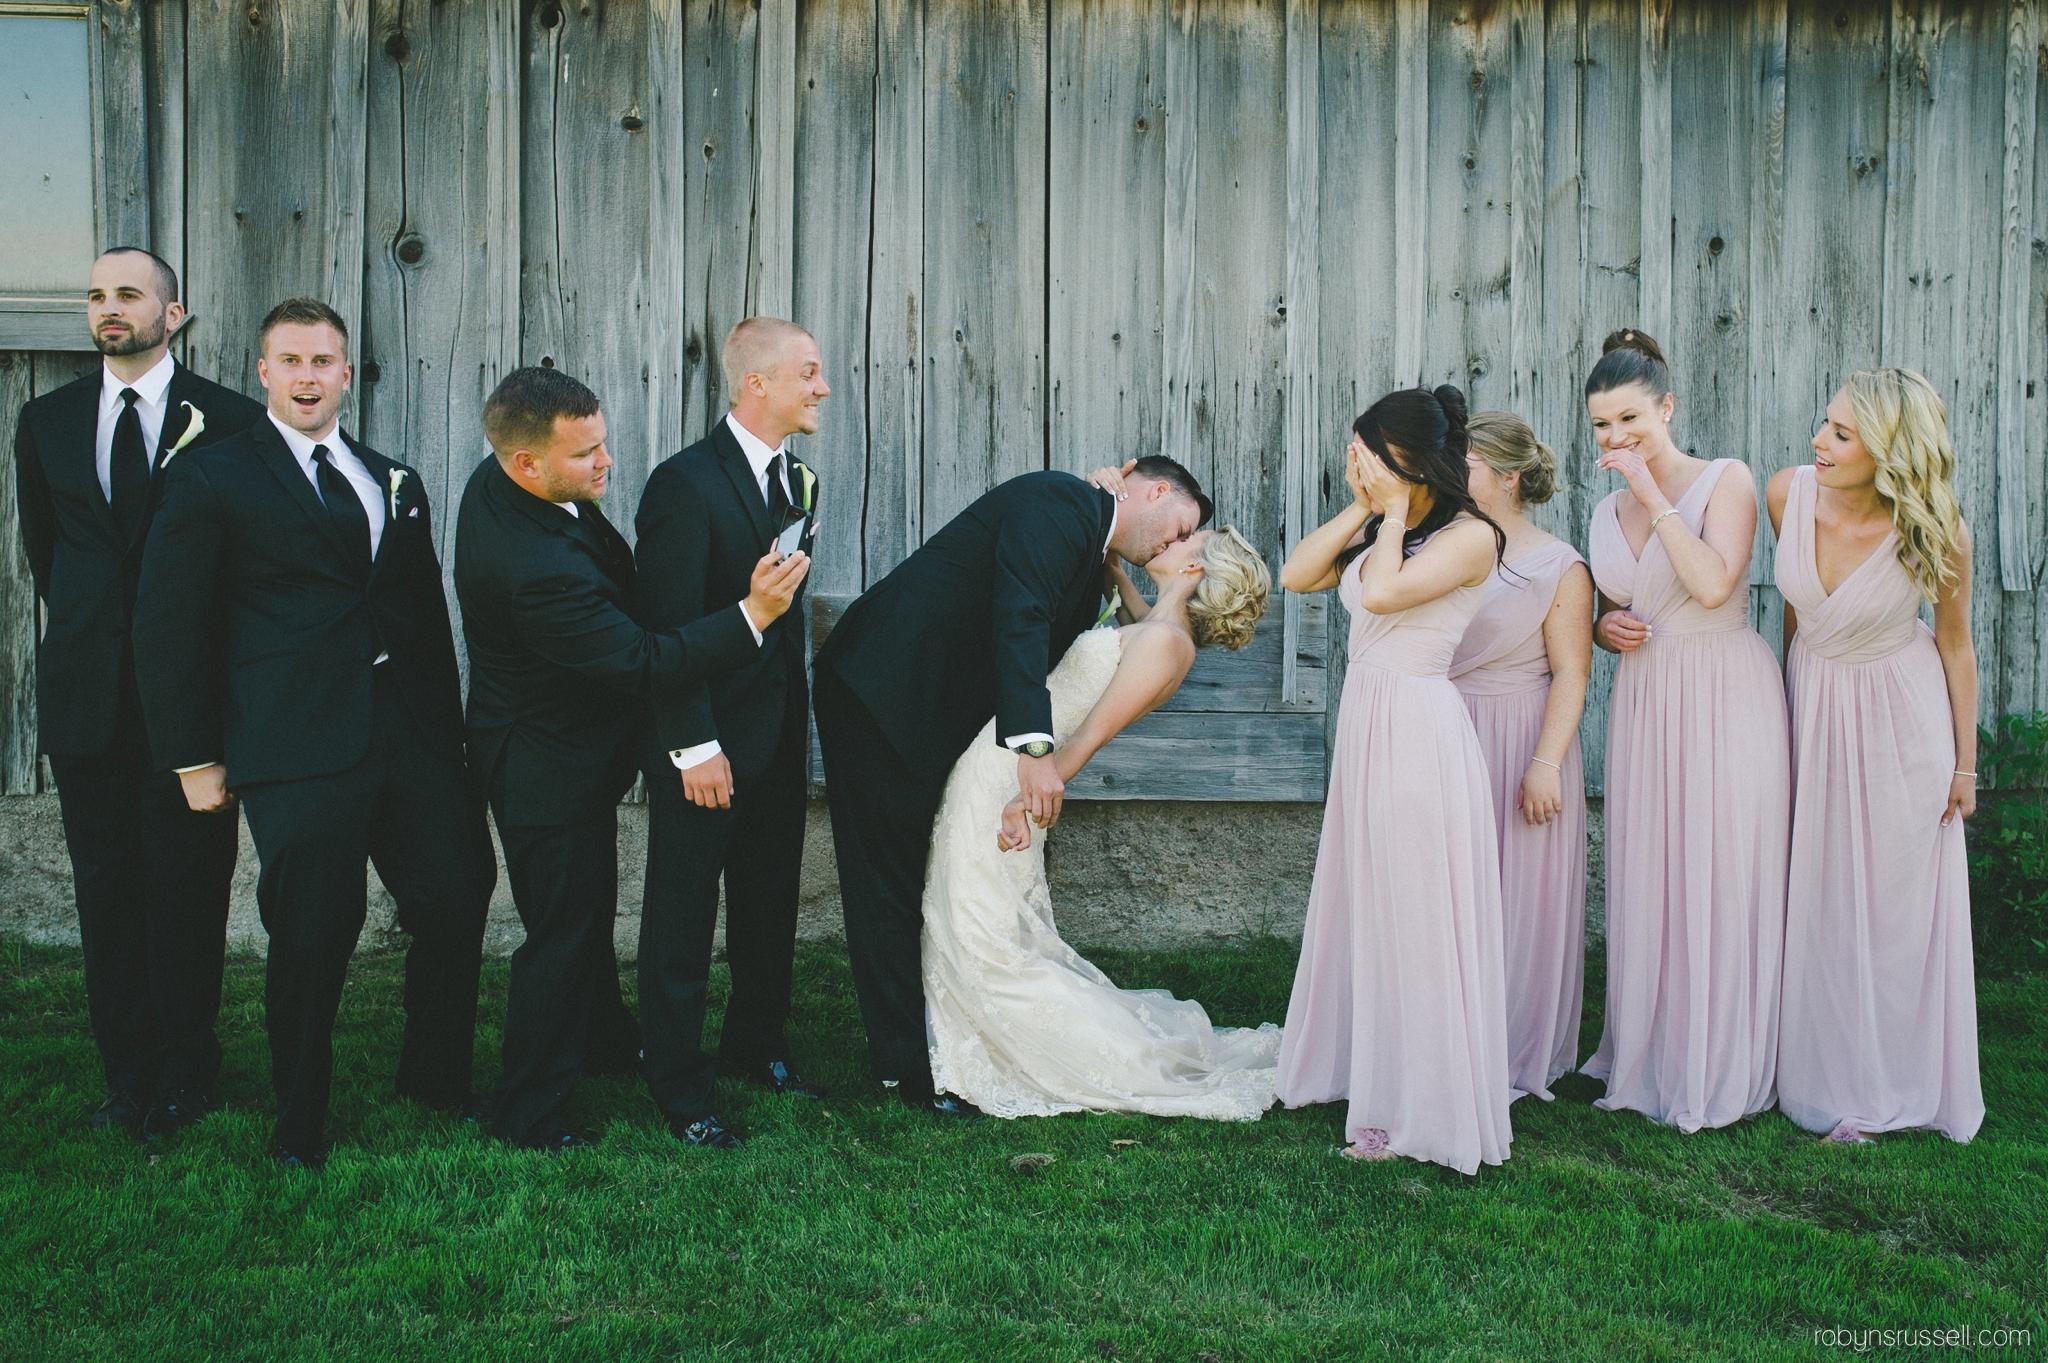 40-bridal-party-kissing-pipers-heath.jpg